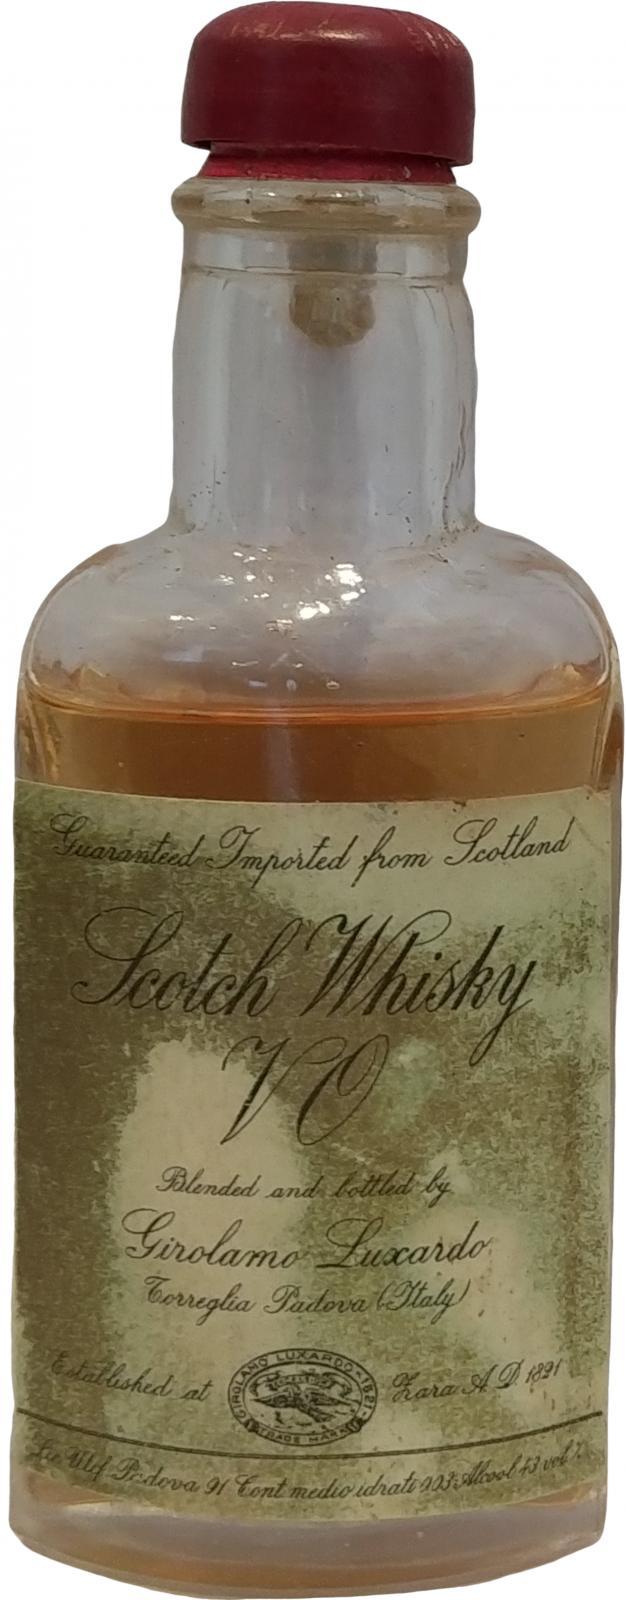 Scotch Whisky V.O.